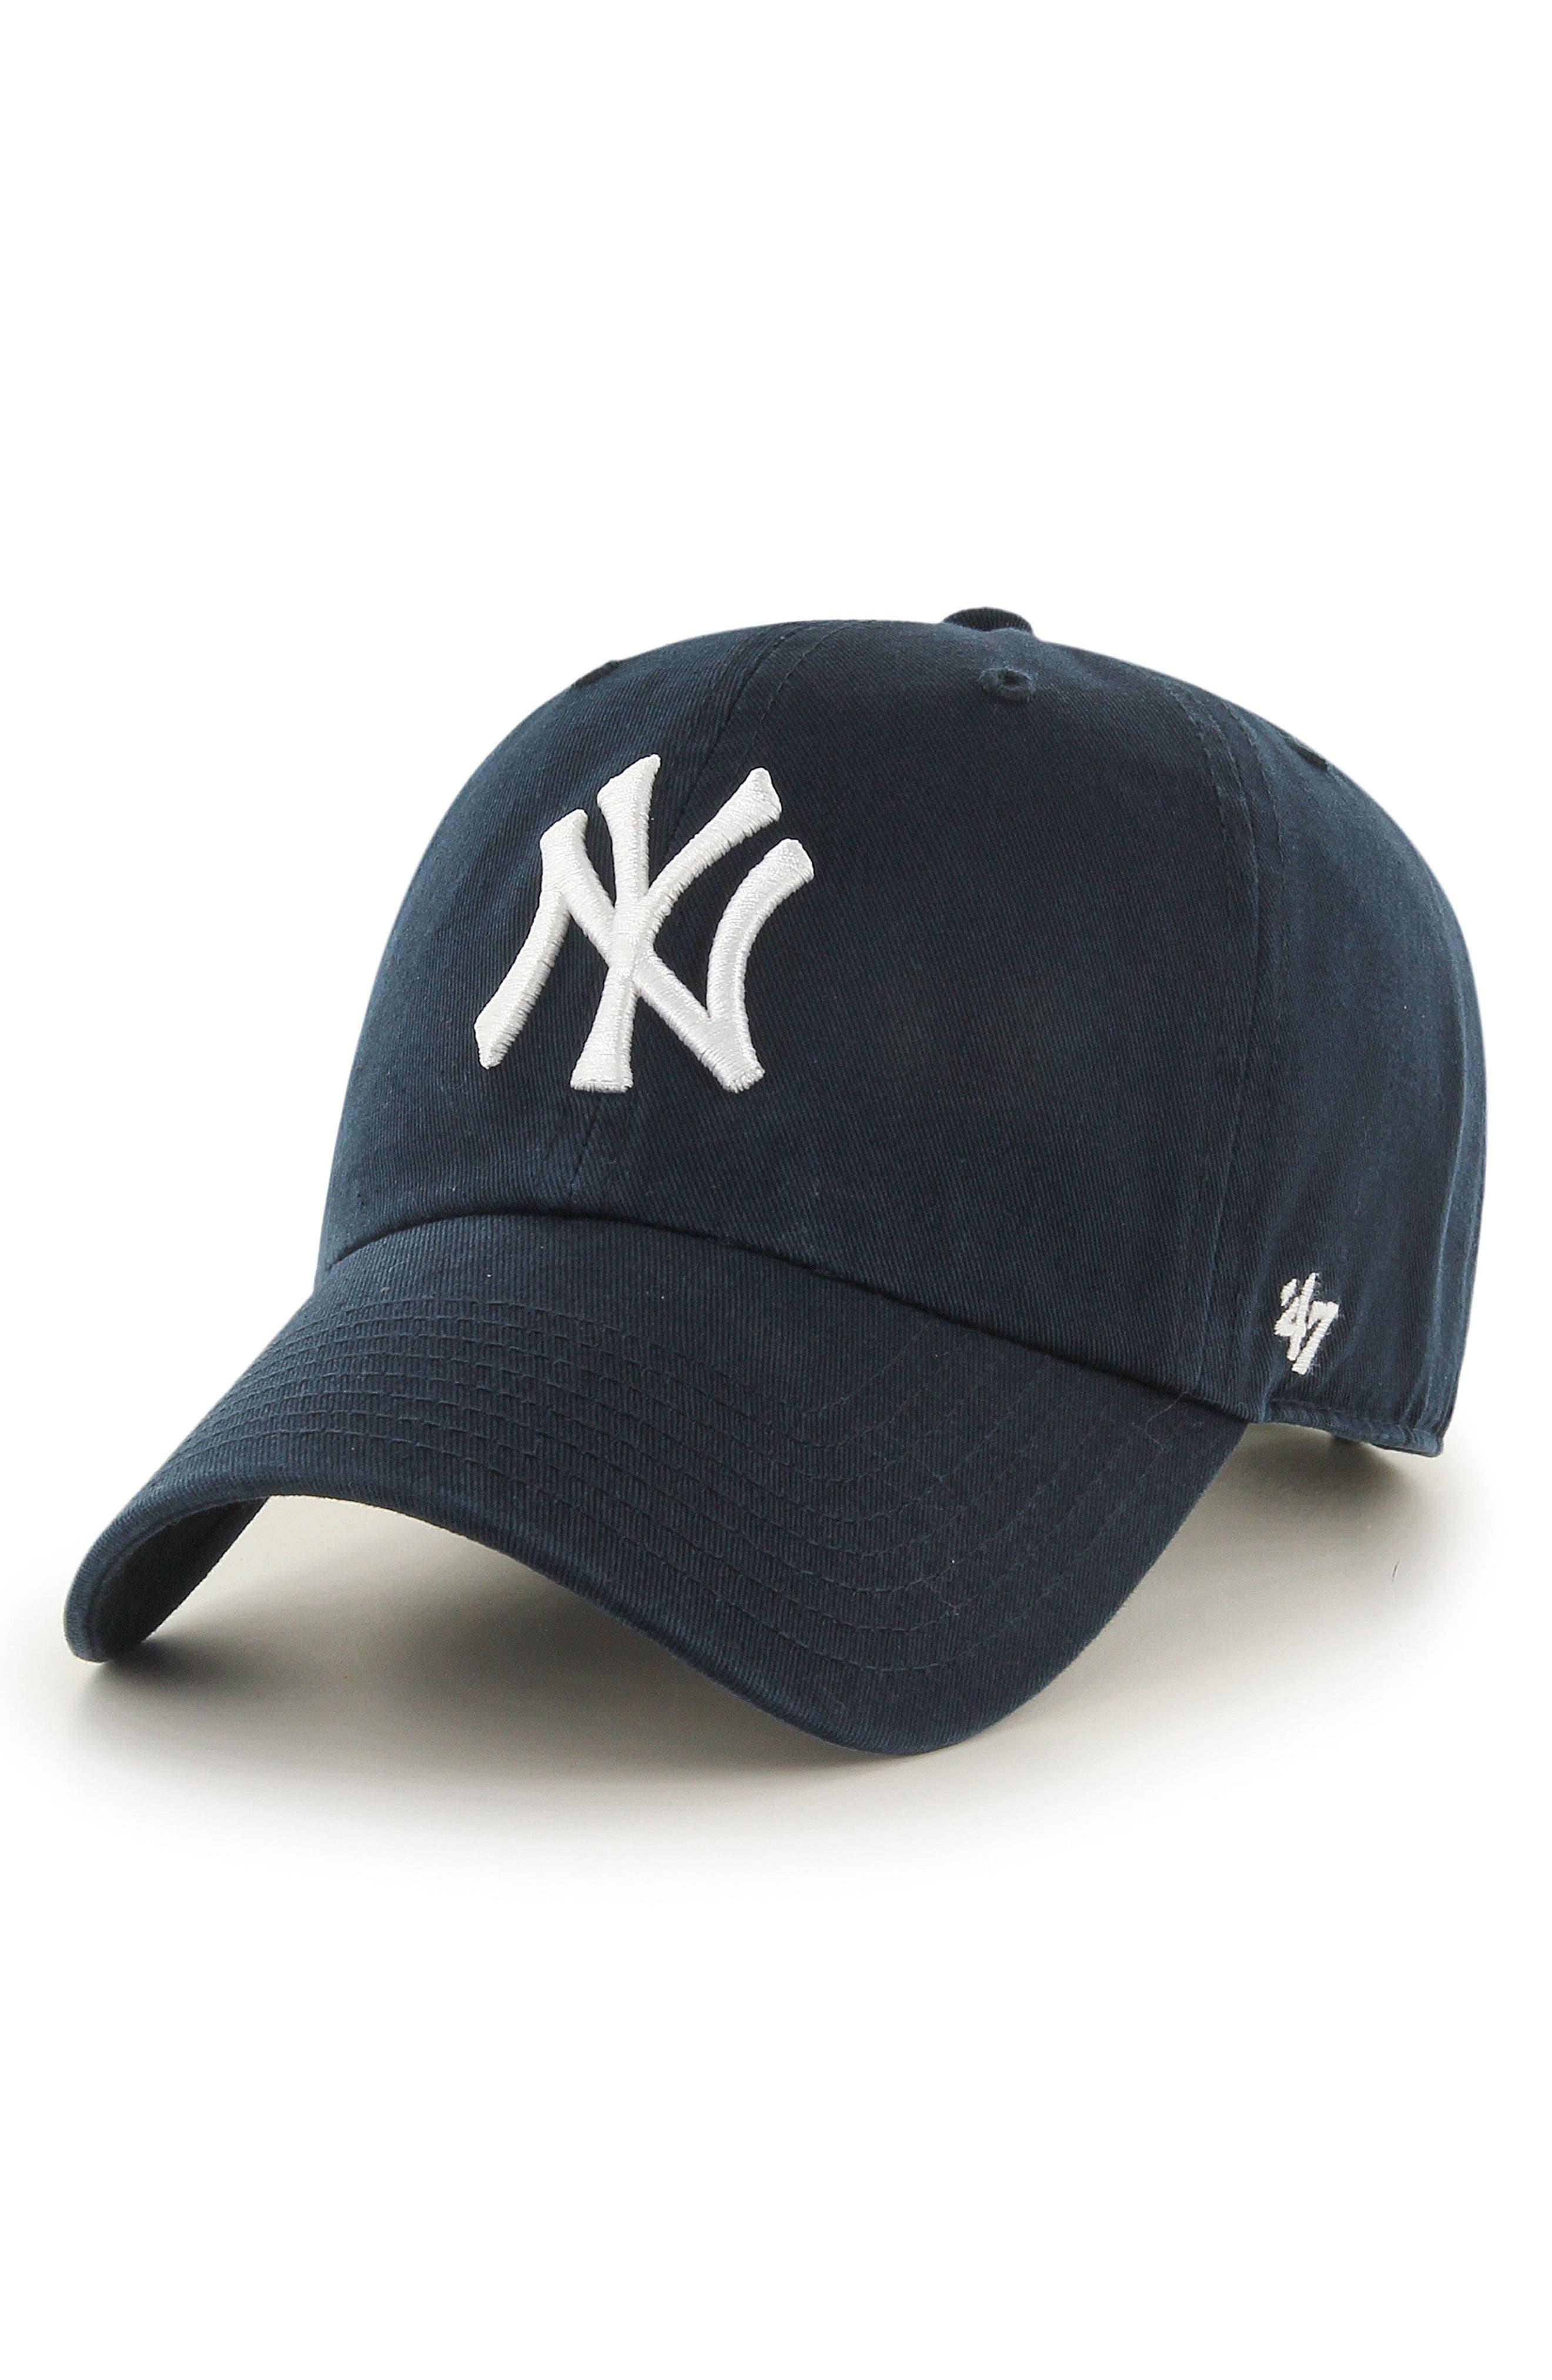 Alternate Image 1 Selected - '47 Clean Up NY Yankees Baseball Cap